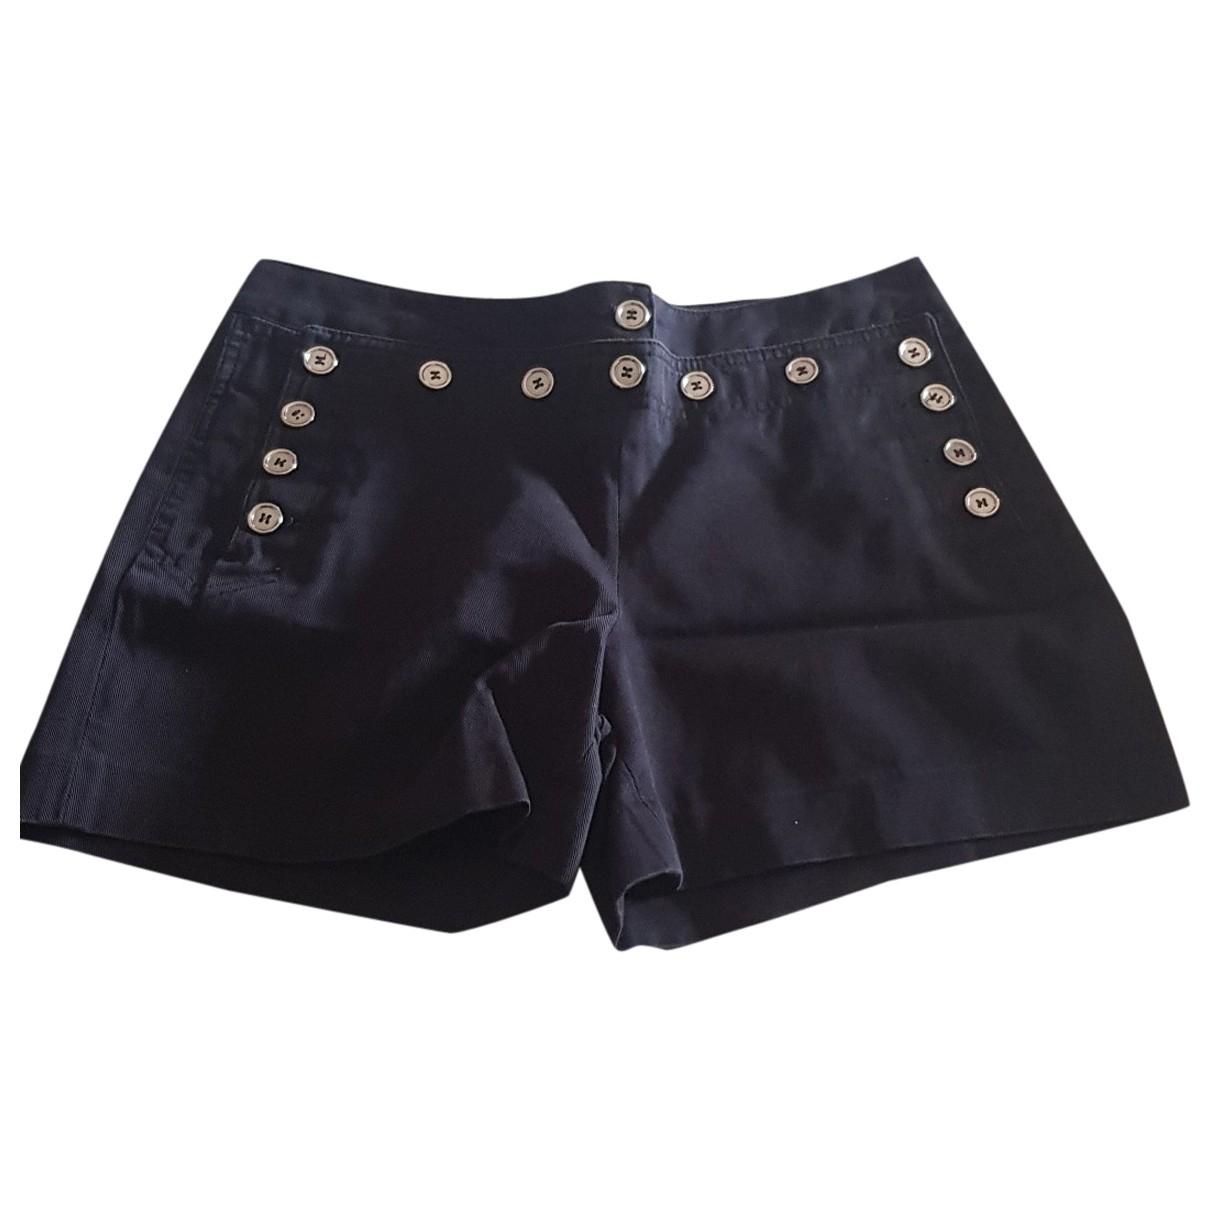 Dolce & Gabbana N Blue Cotton Shorts for Women 38 FR